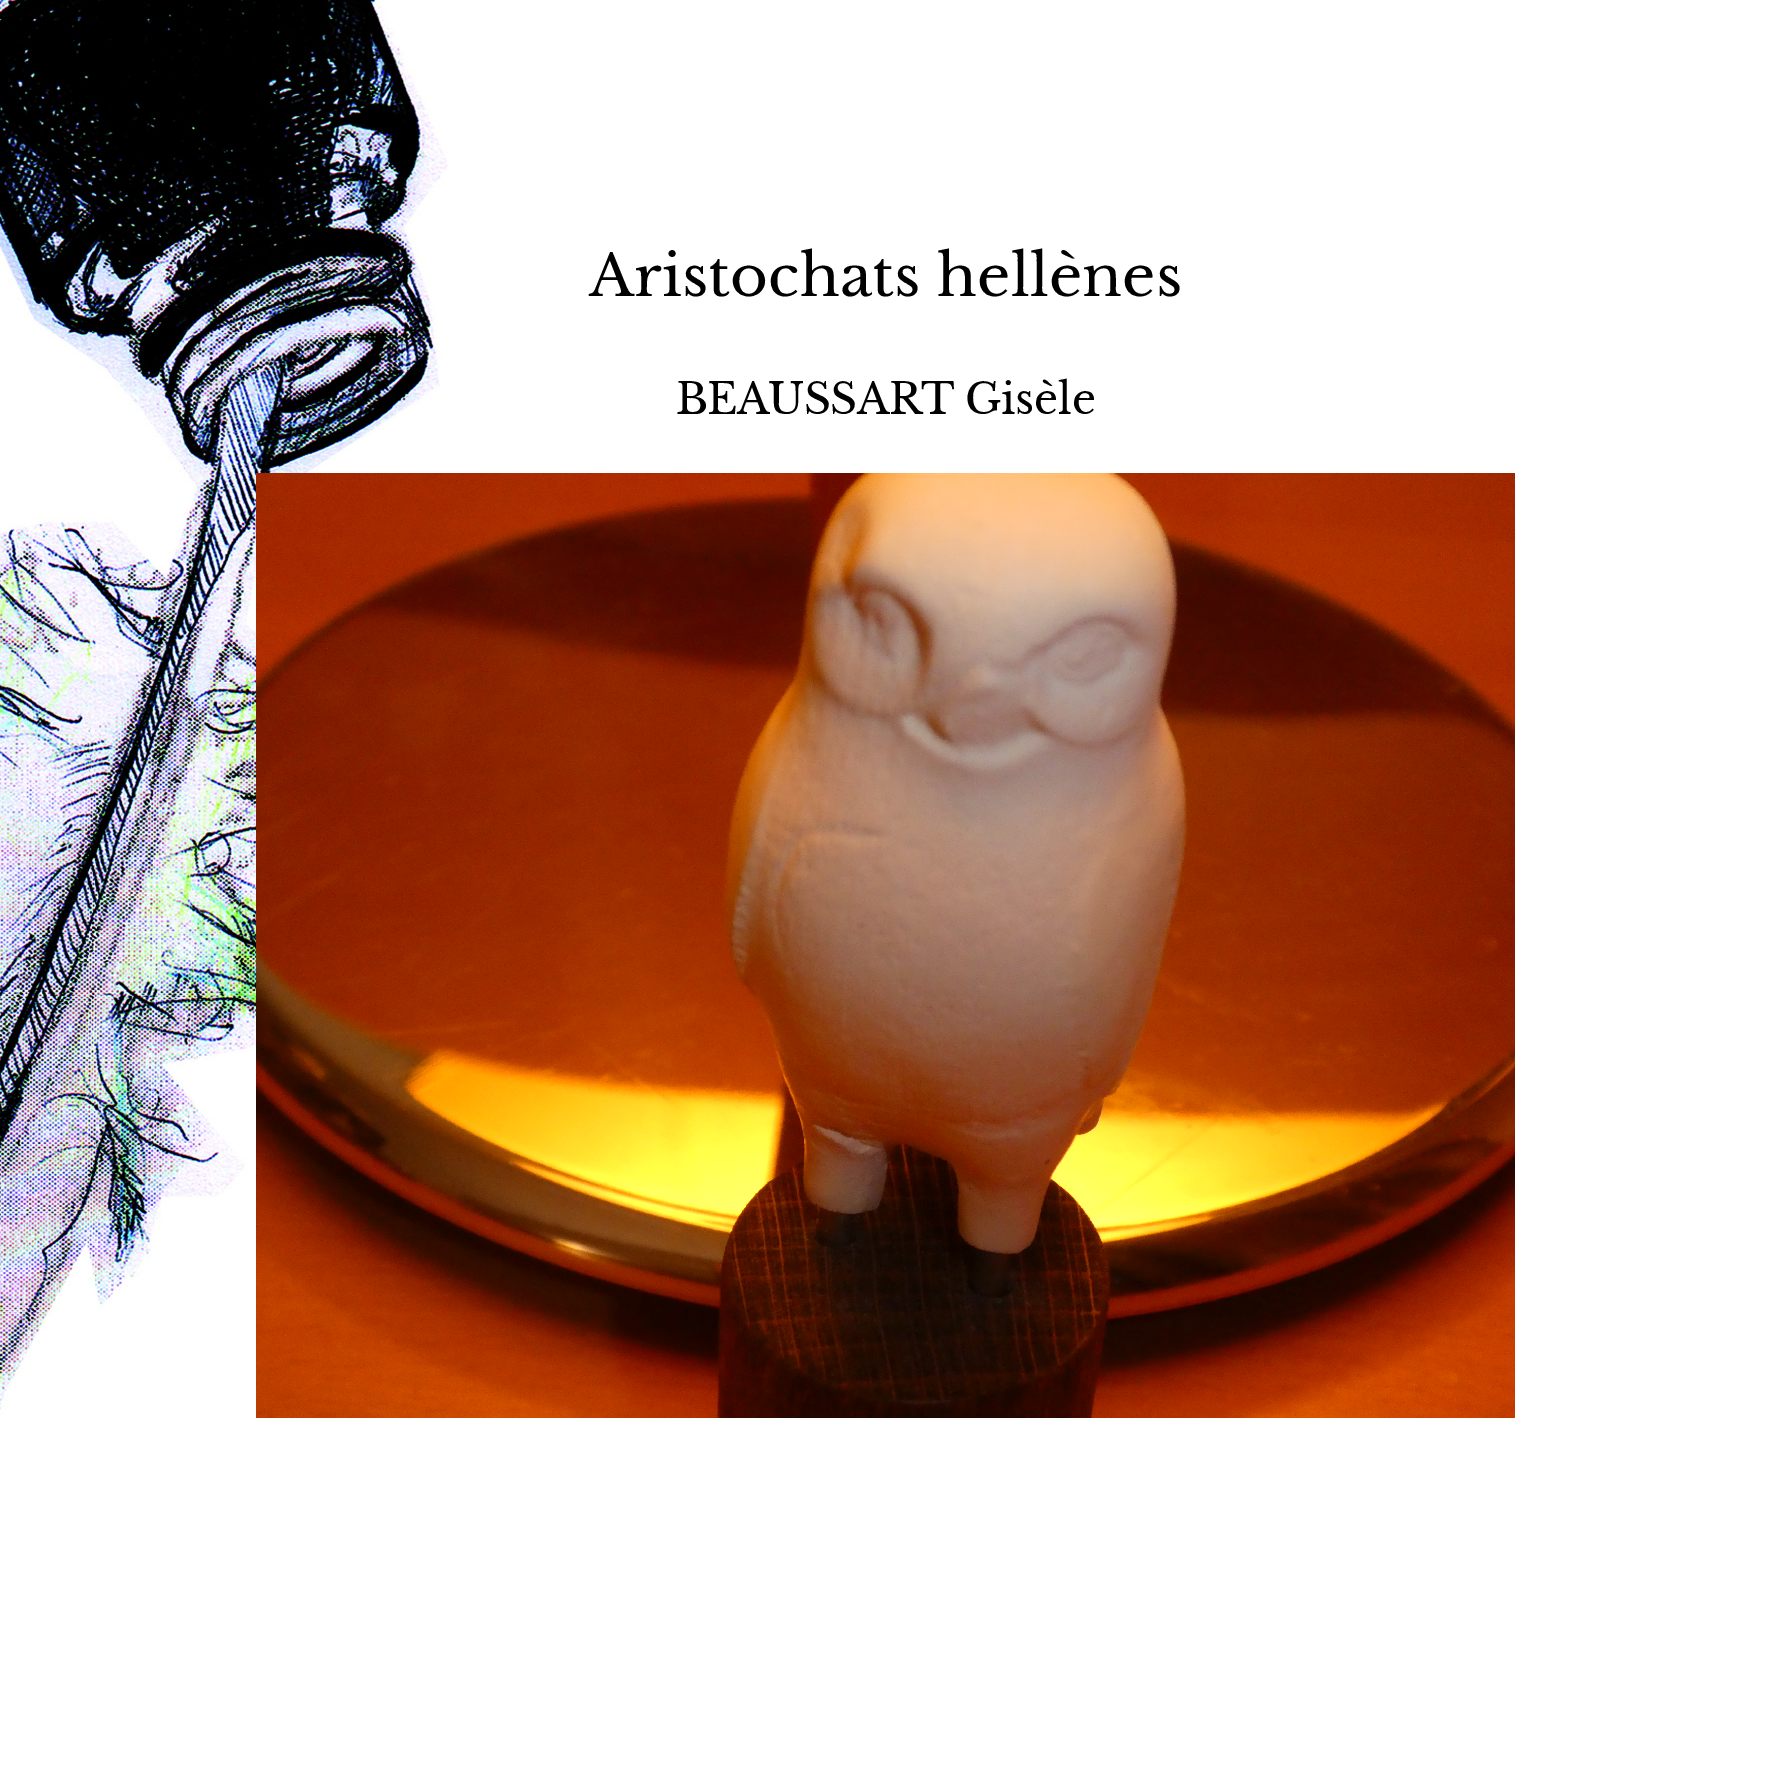 Aristochats hellènes